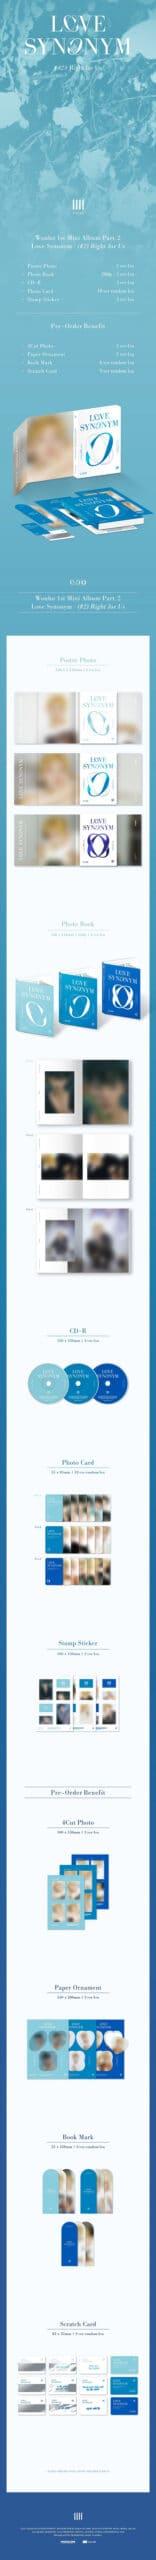 WONHO 1st Mini Part.2 Love Synonym 2 Right for Us Random Ver. 1 scaled